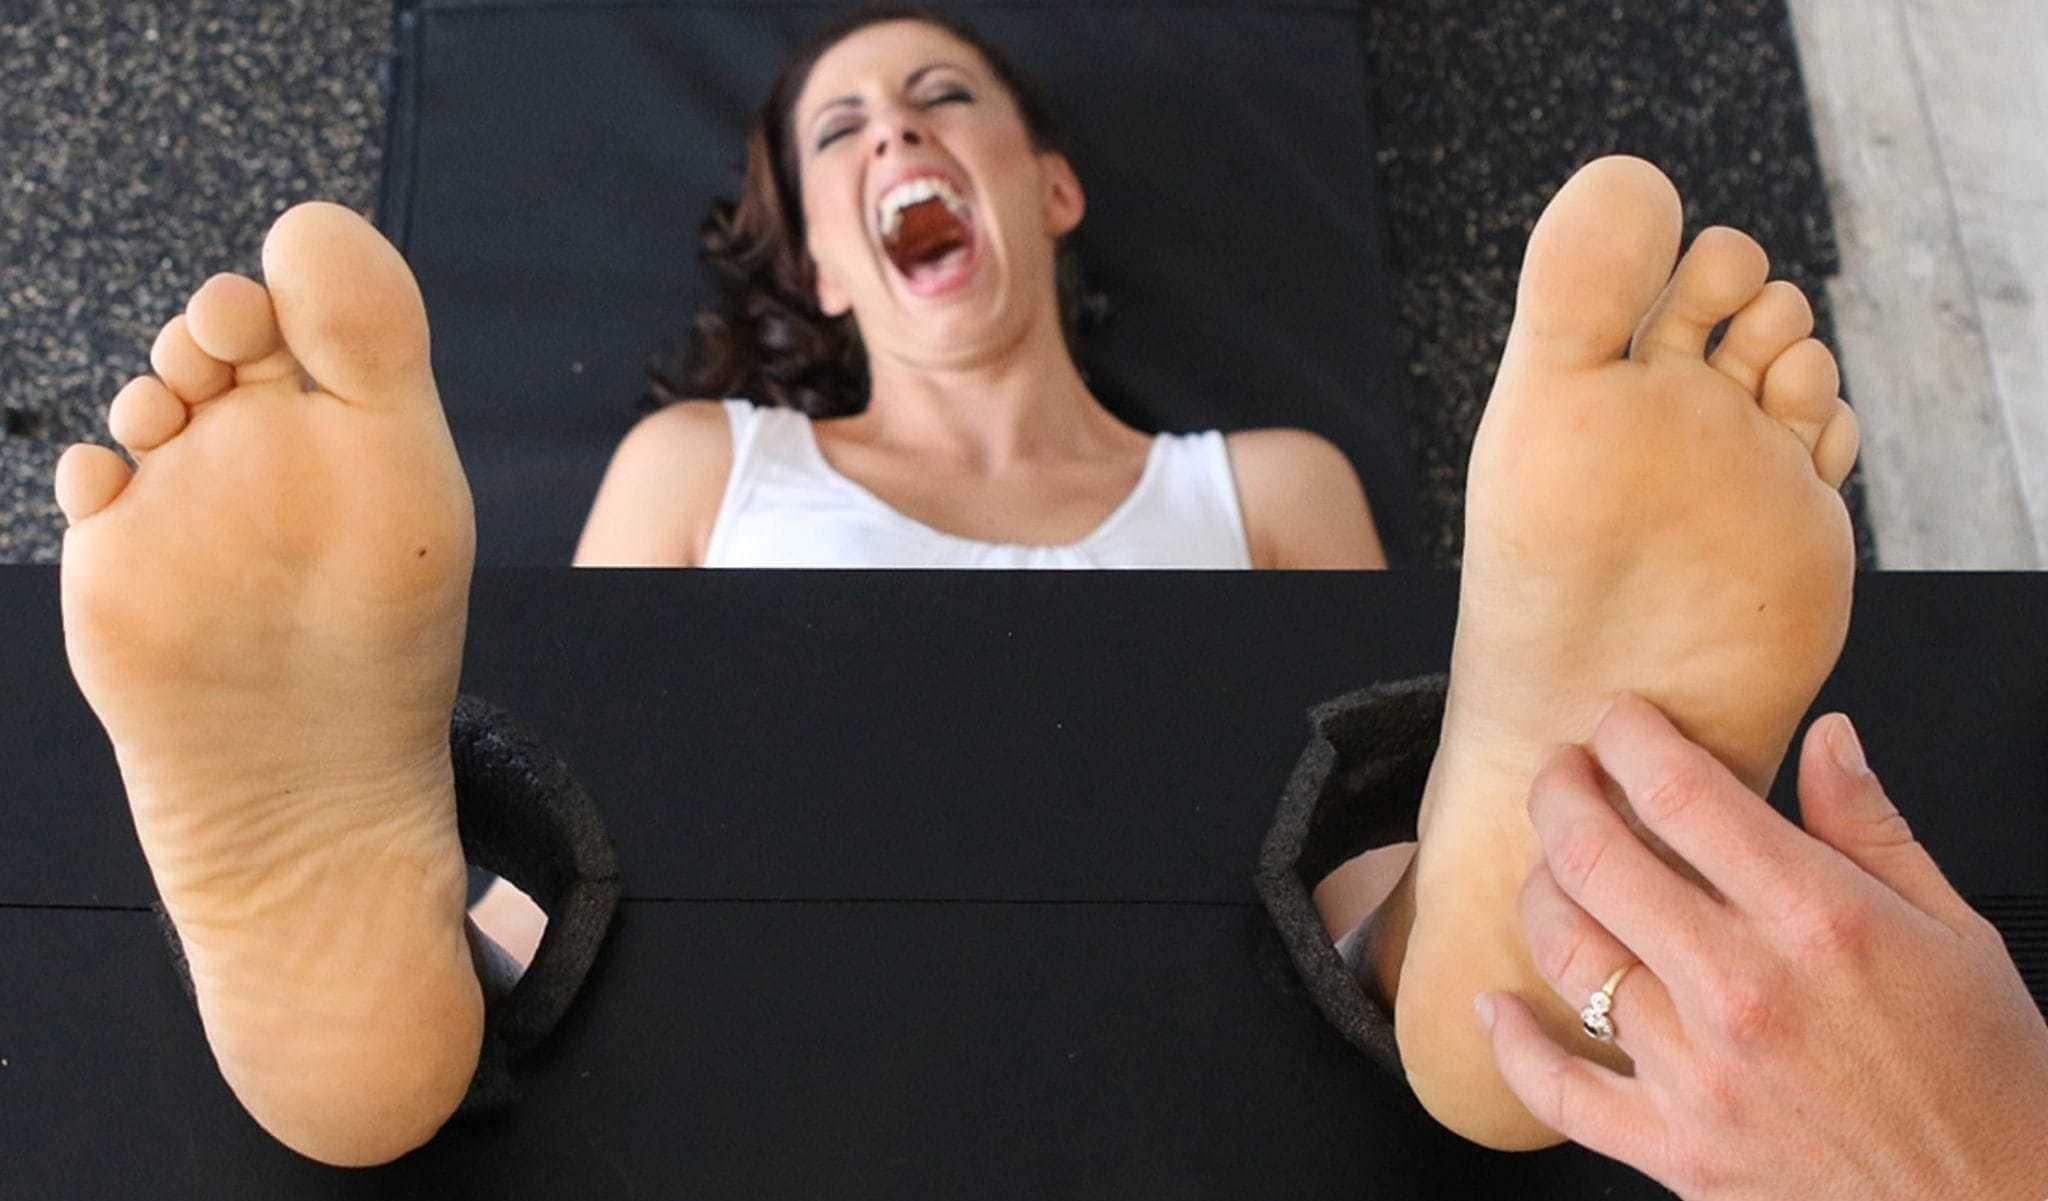 Crazily Ticklish Girls Have Fun : Calie Tickles Jennie's Feet